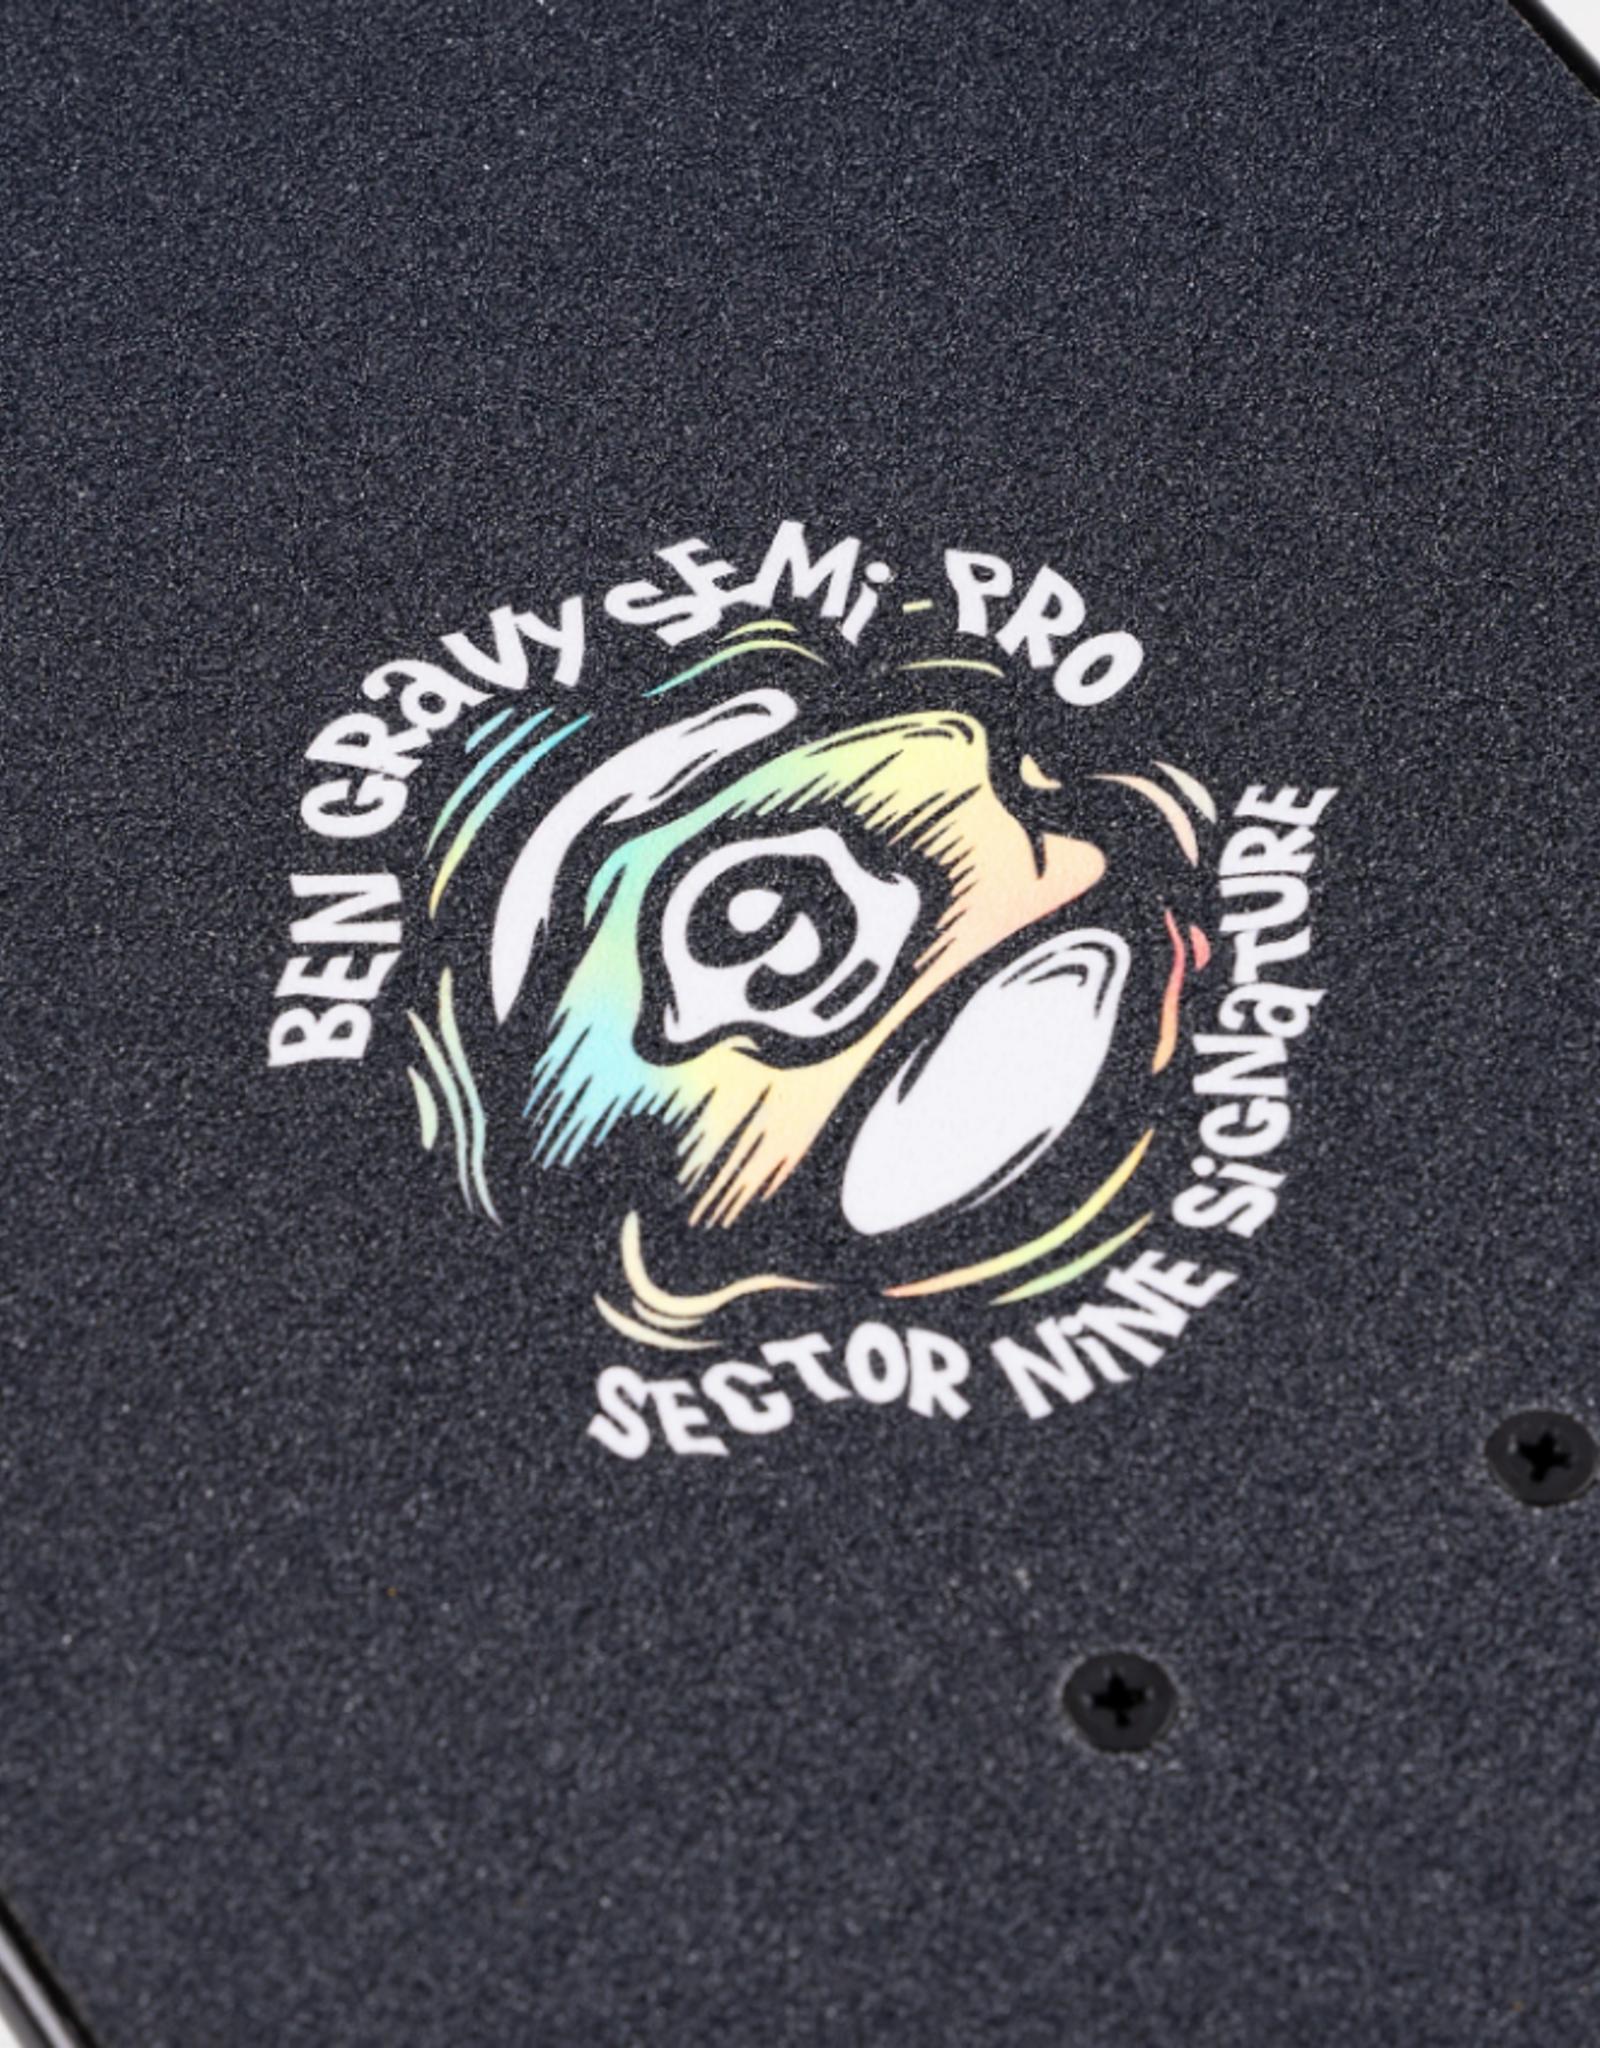 SECTOR 9 GRAVY SEMI-PRO BARGE